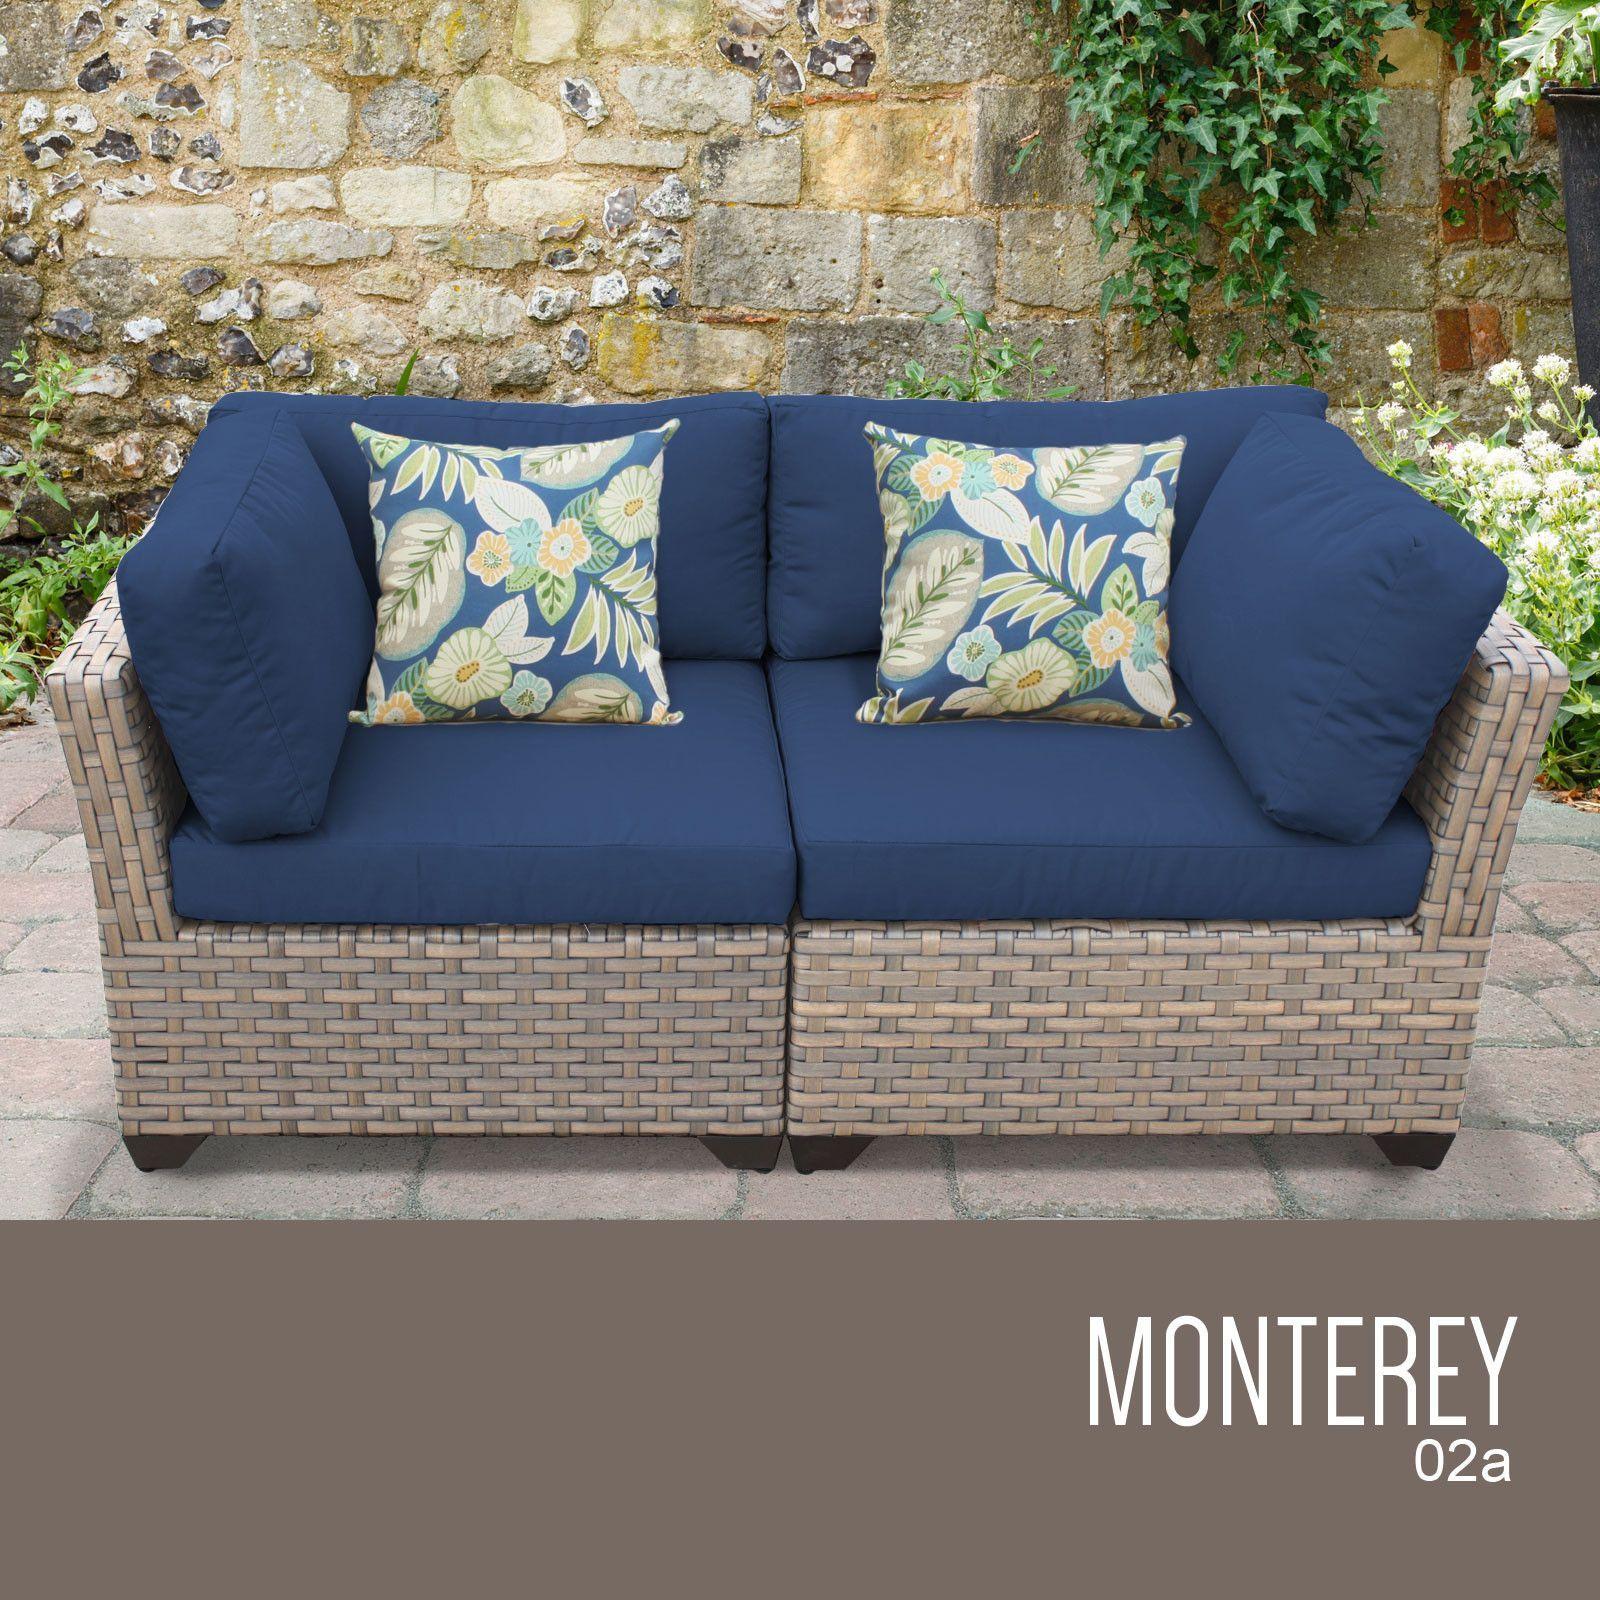 Monterey 2 Piece Outdoor Wicker Patio Furniture Set 02a